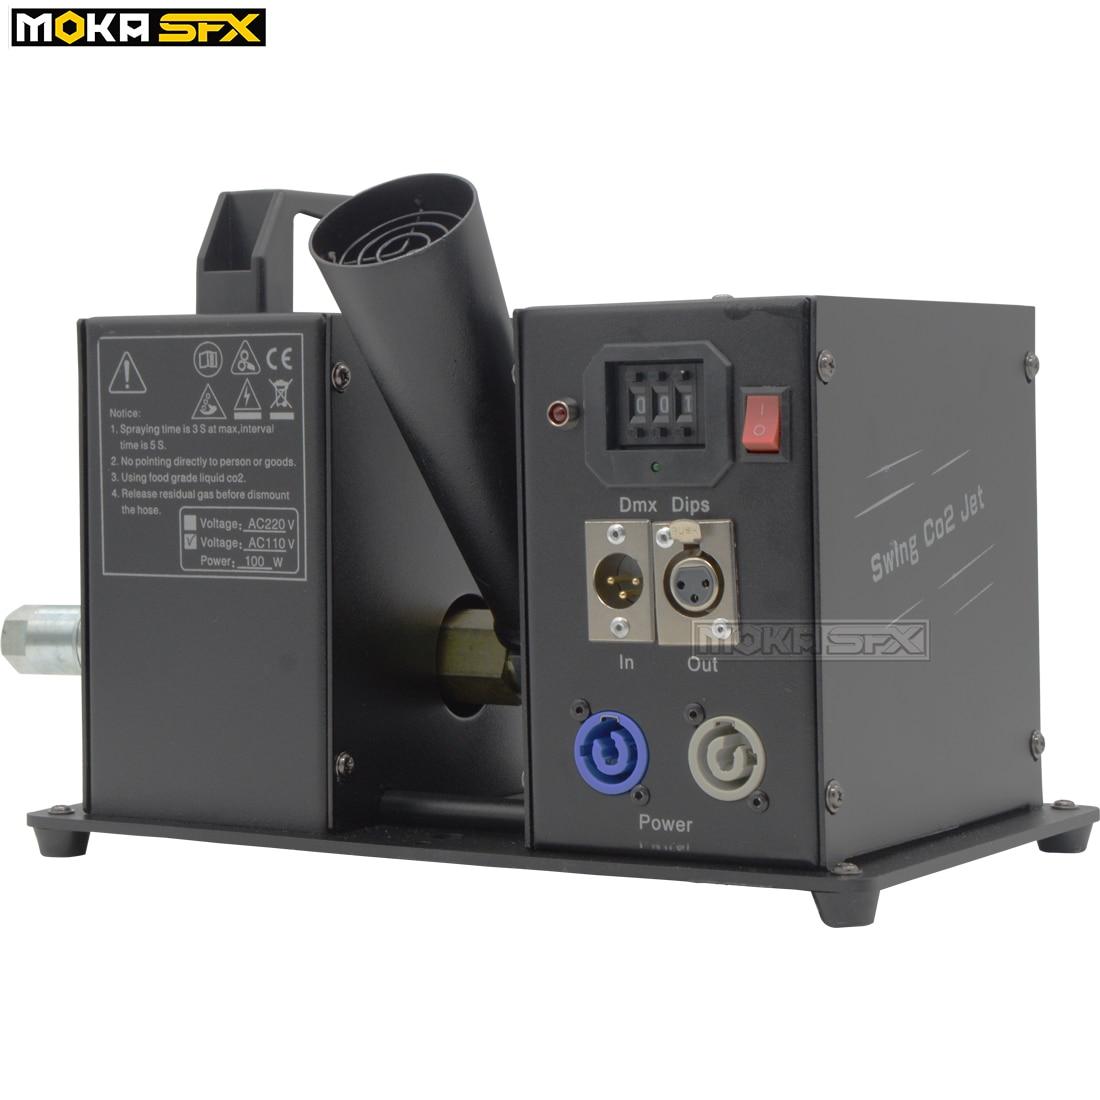 MOKA SFX Swing Co2 Jet Machine New Year Projector Cryo Jet Cannon Spray 8-10m Co2 Jet For Dj Stage Performance